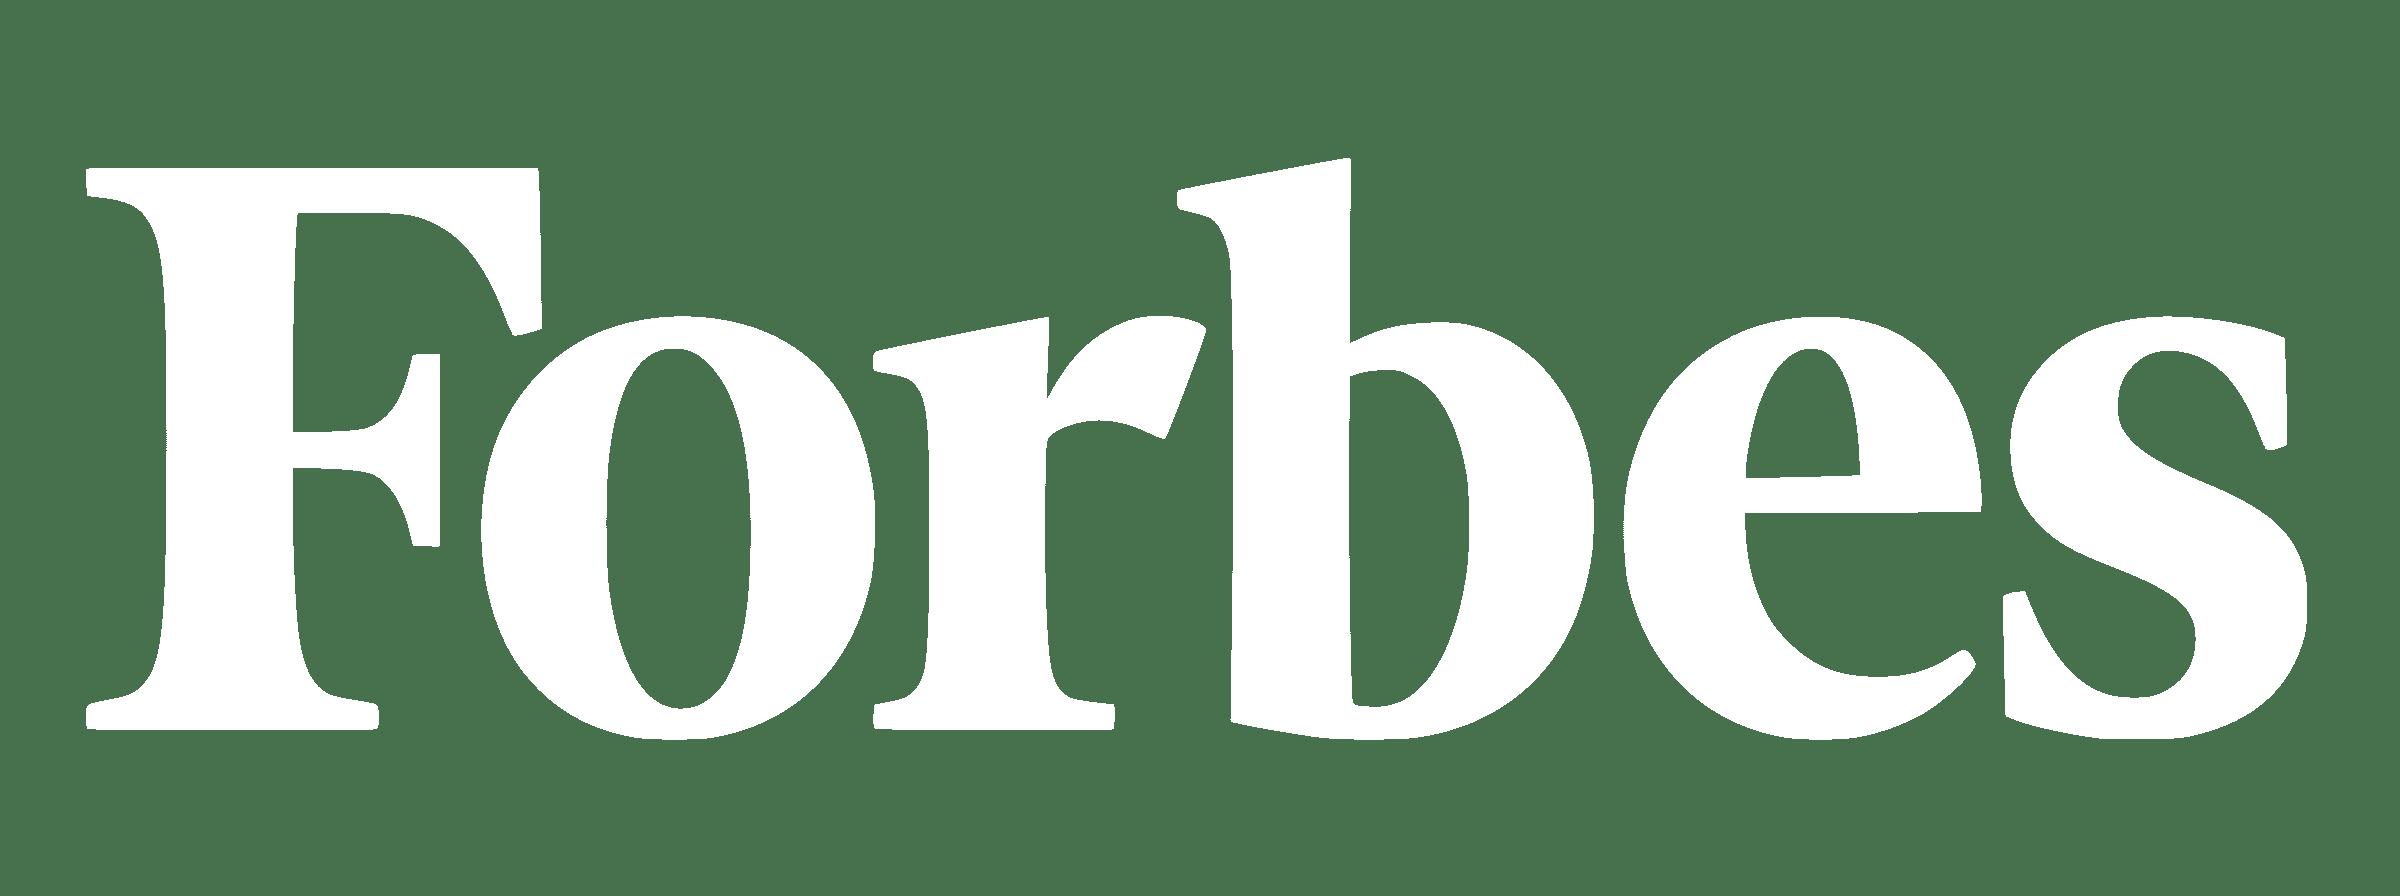 https://goodcomesfirst.com/wp-content/uploads/2021/05/forbes-white-logo.png